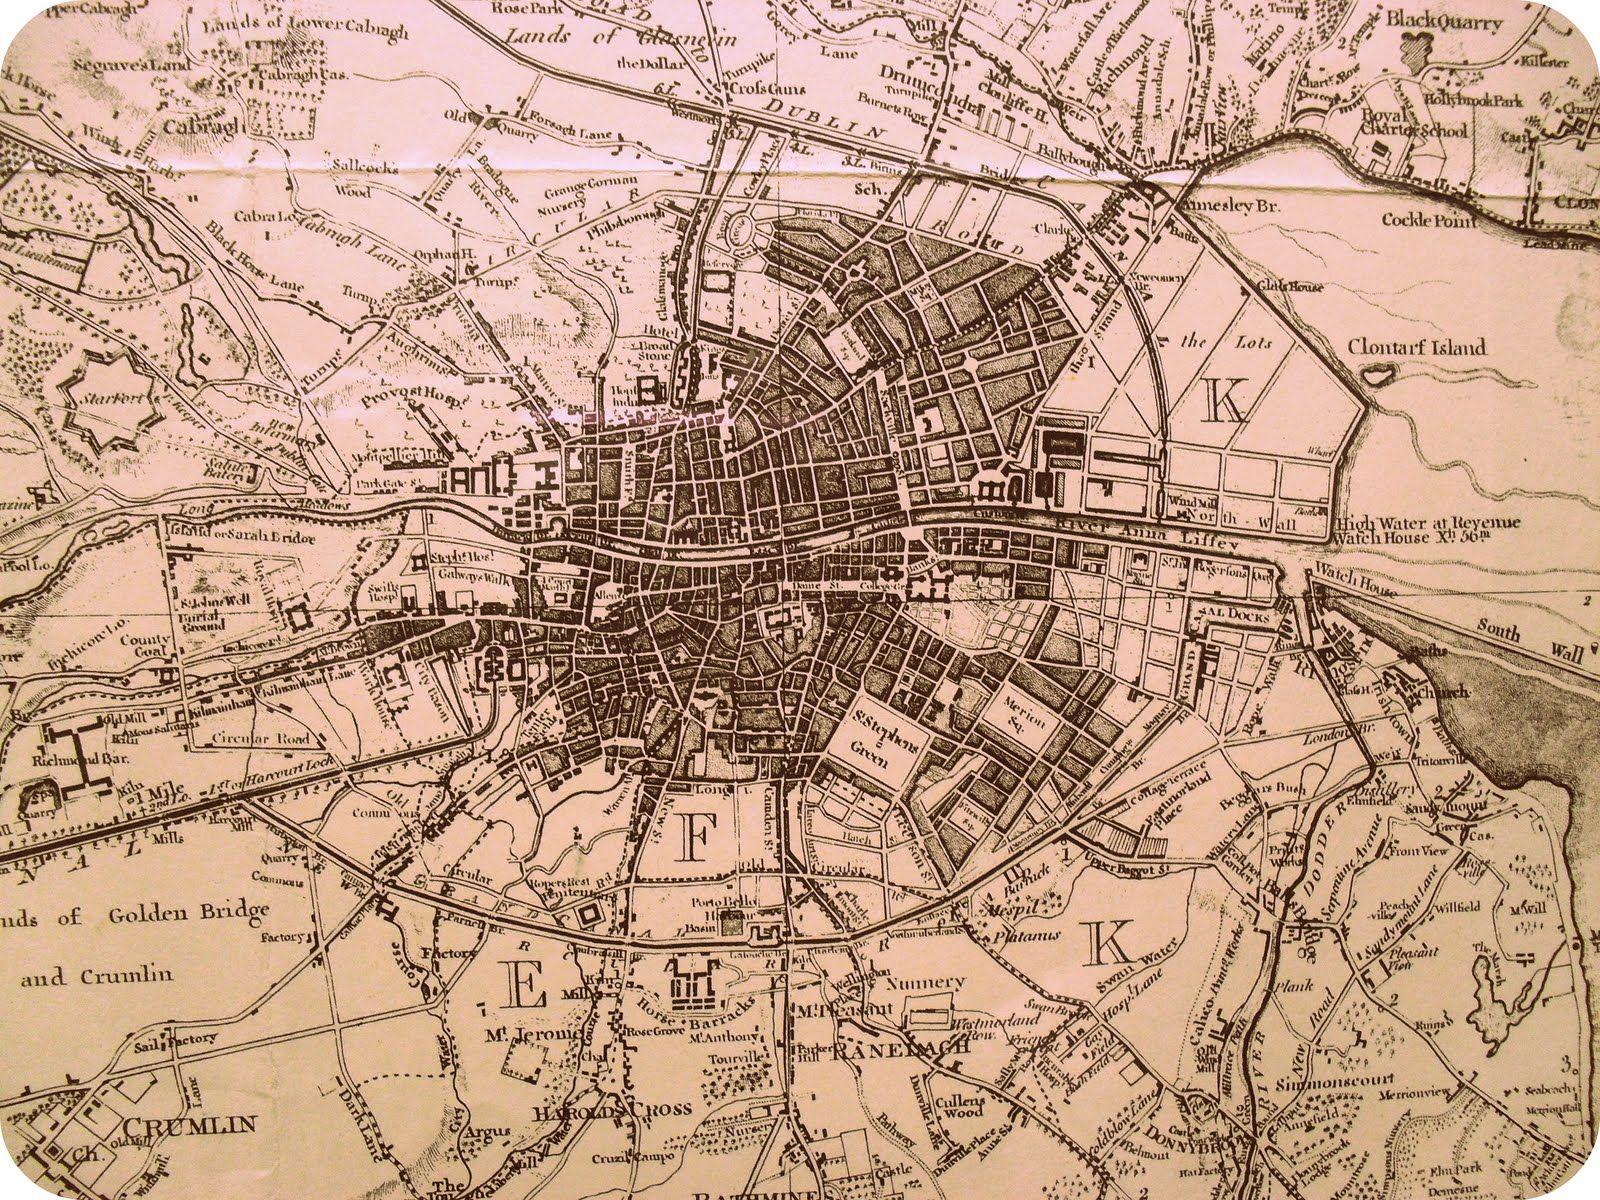 old dublin ireland map from the 1800s genealogy pinterest